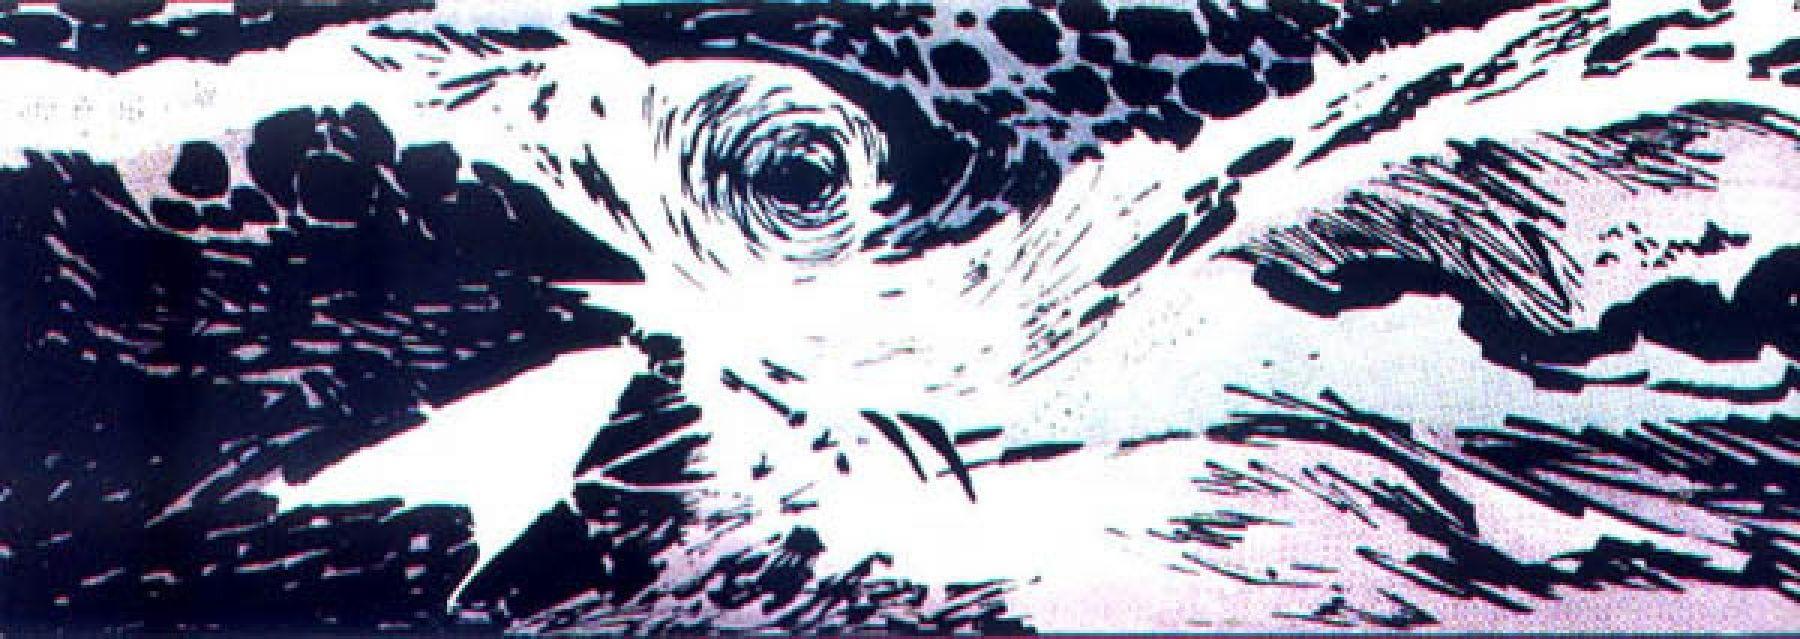 La forza devastante dell'Oceano Pacifico